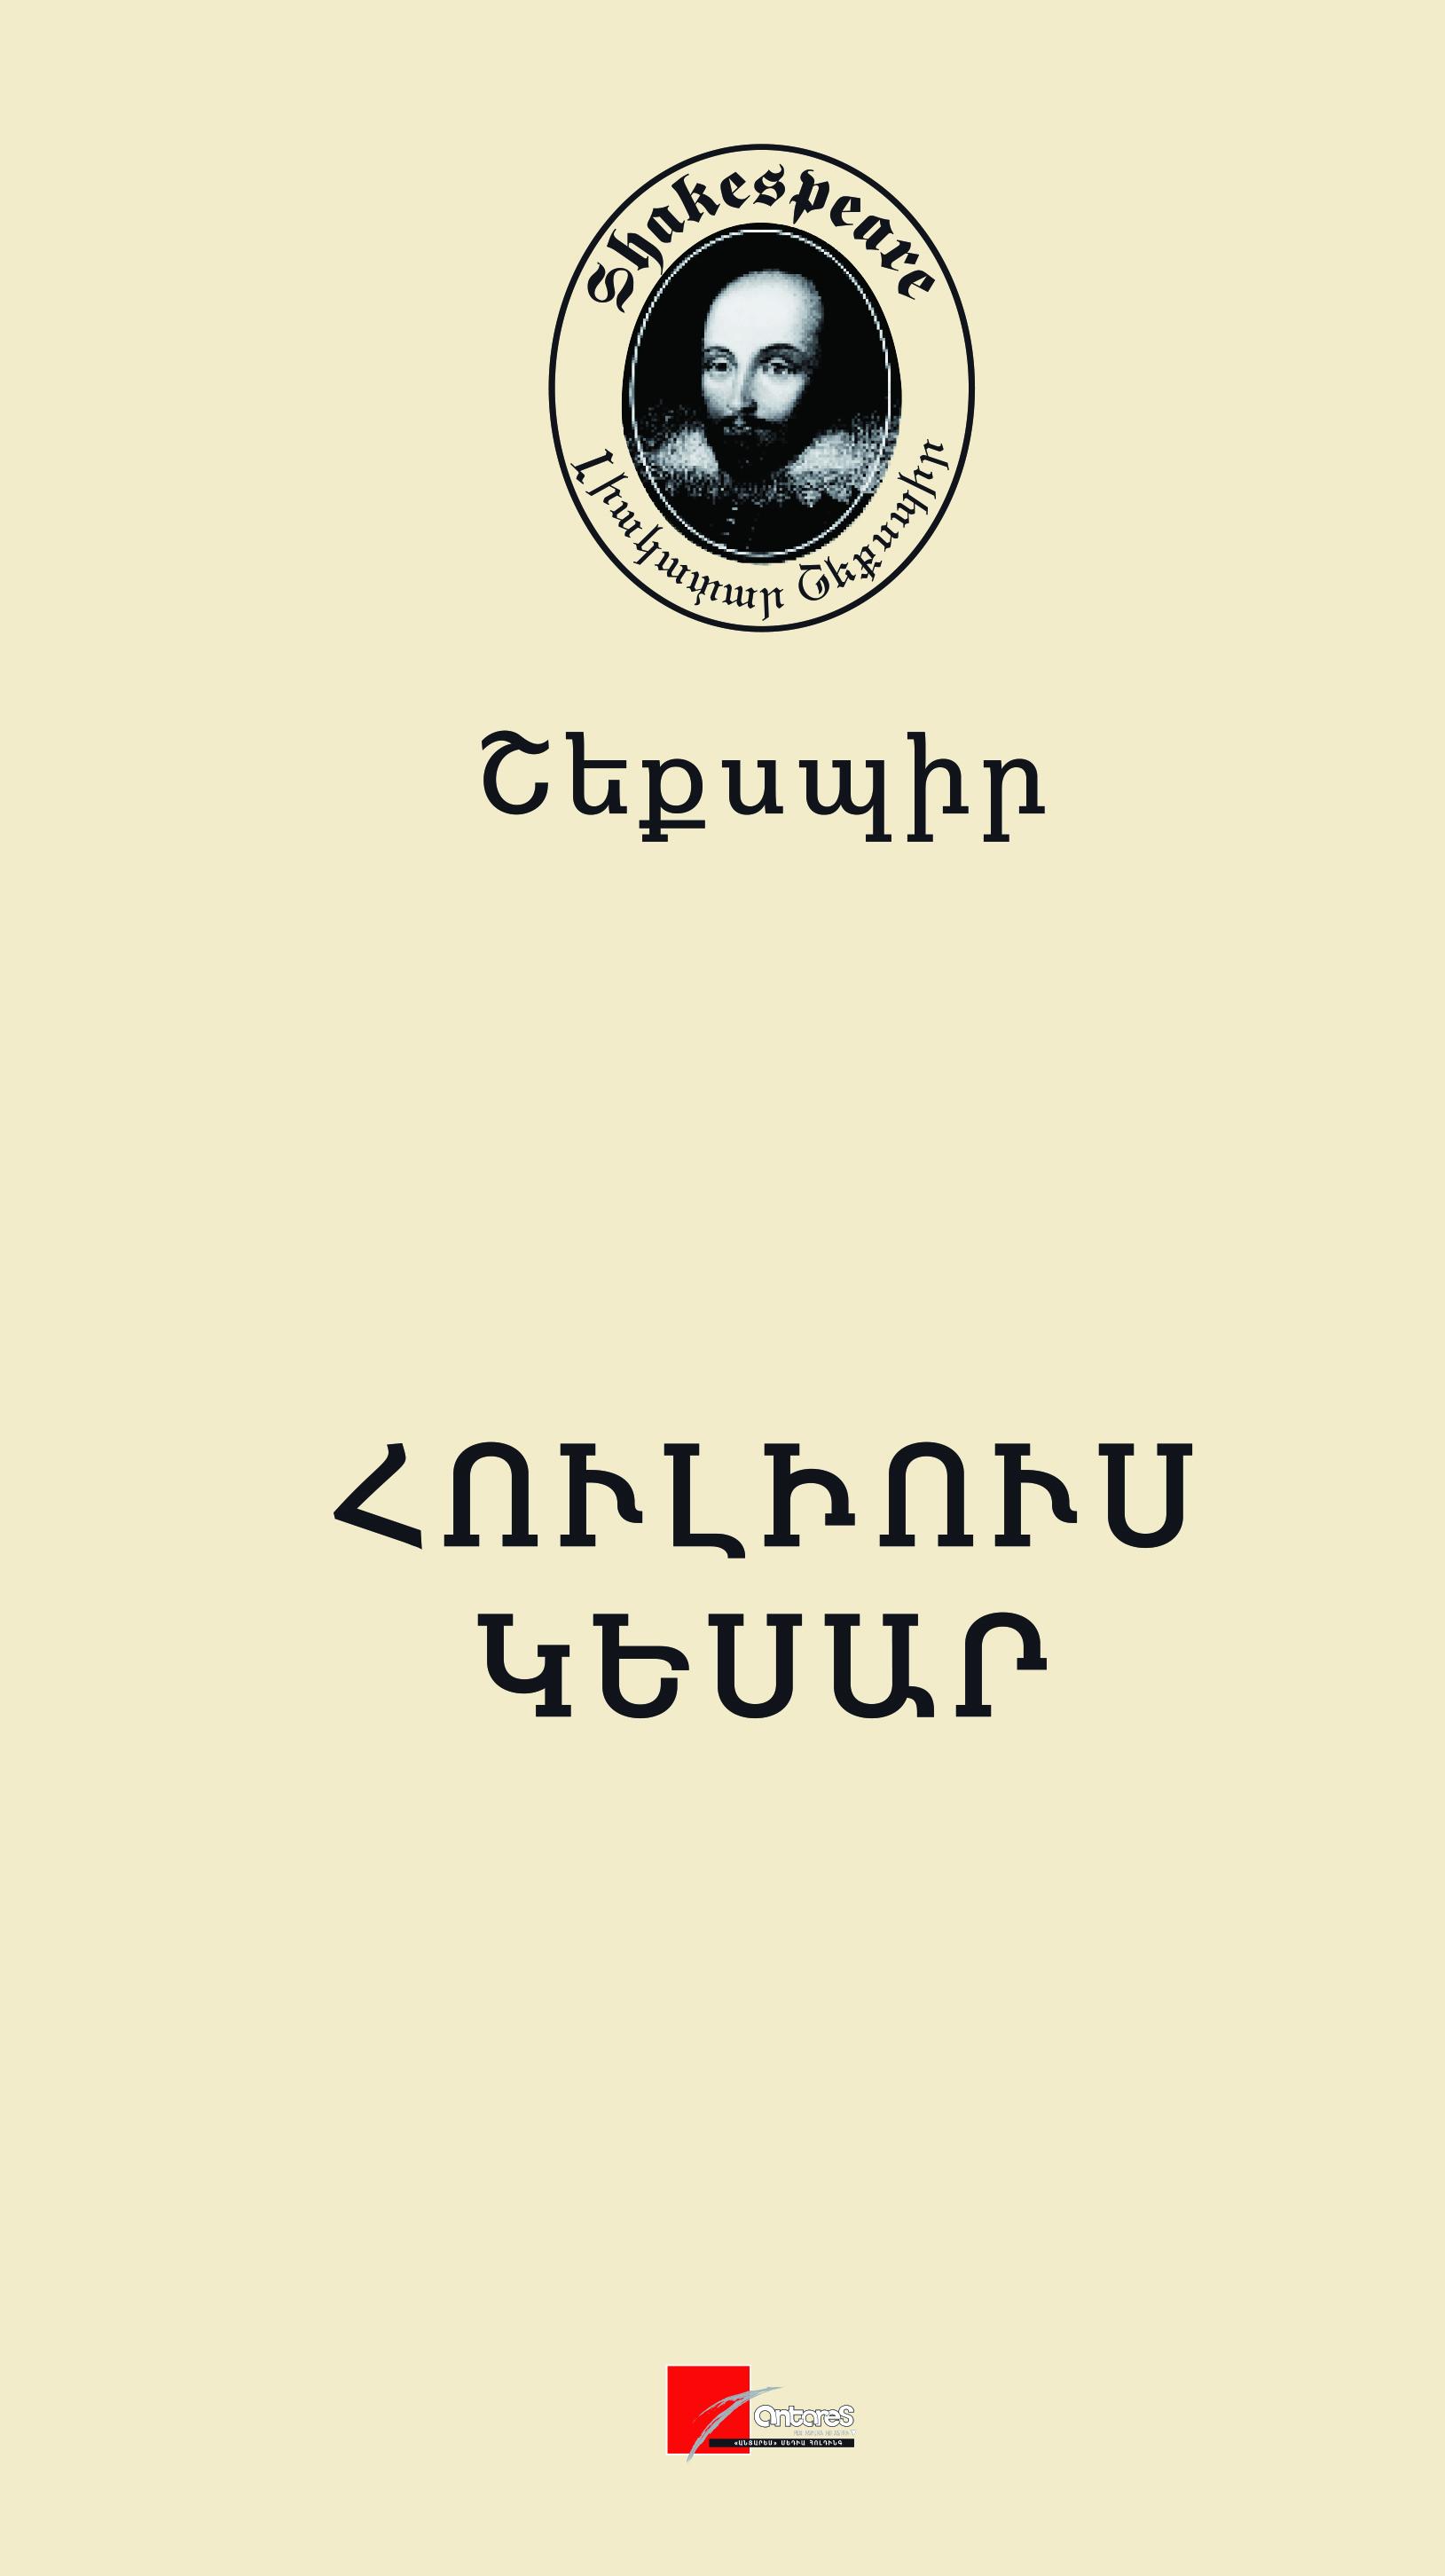 Sheqspir-Julius Ceasar.cdr